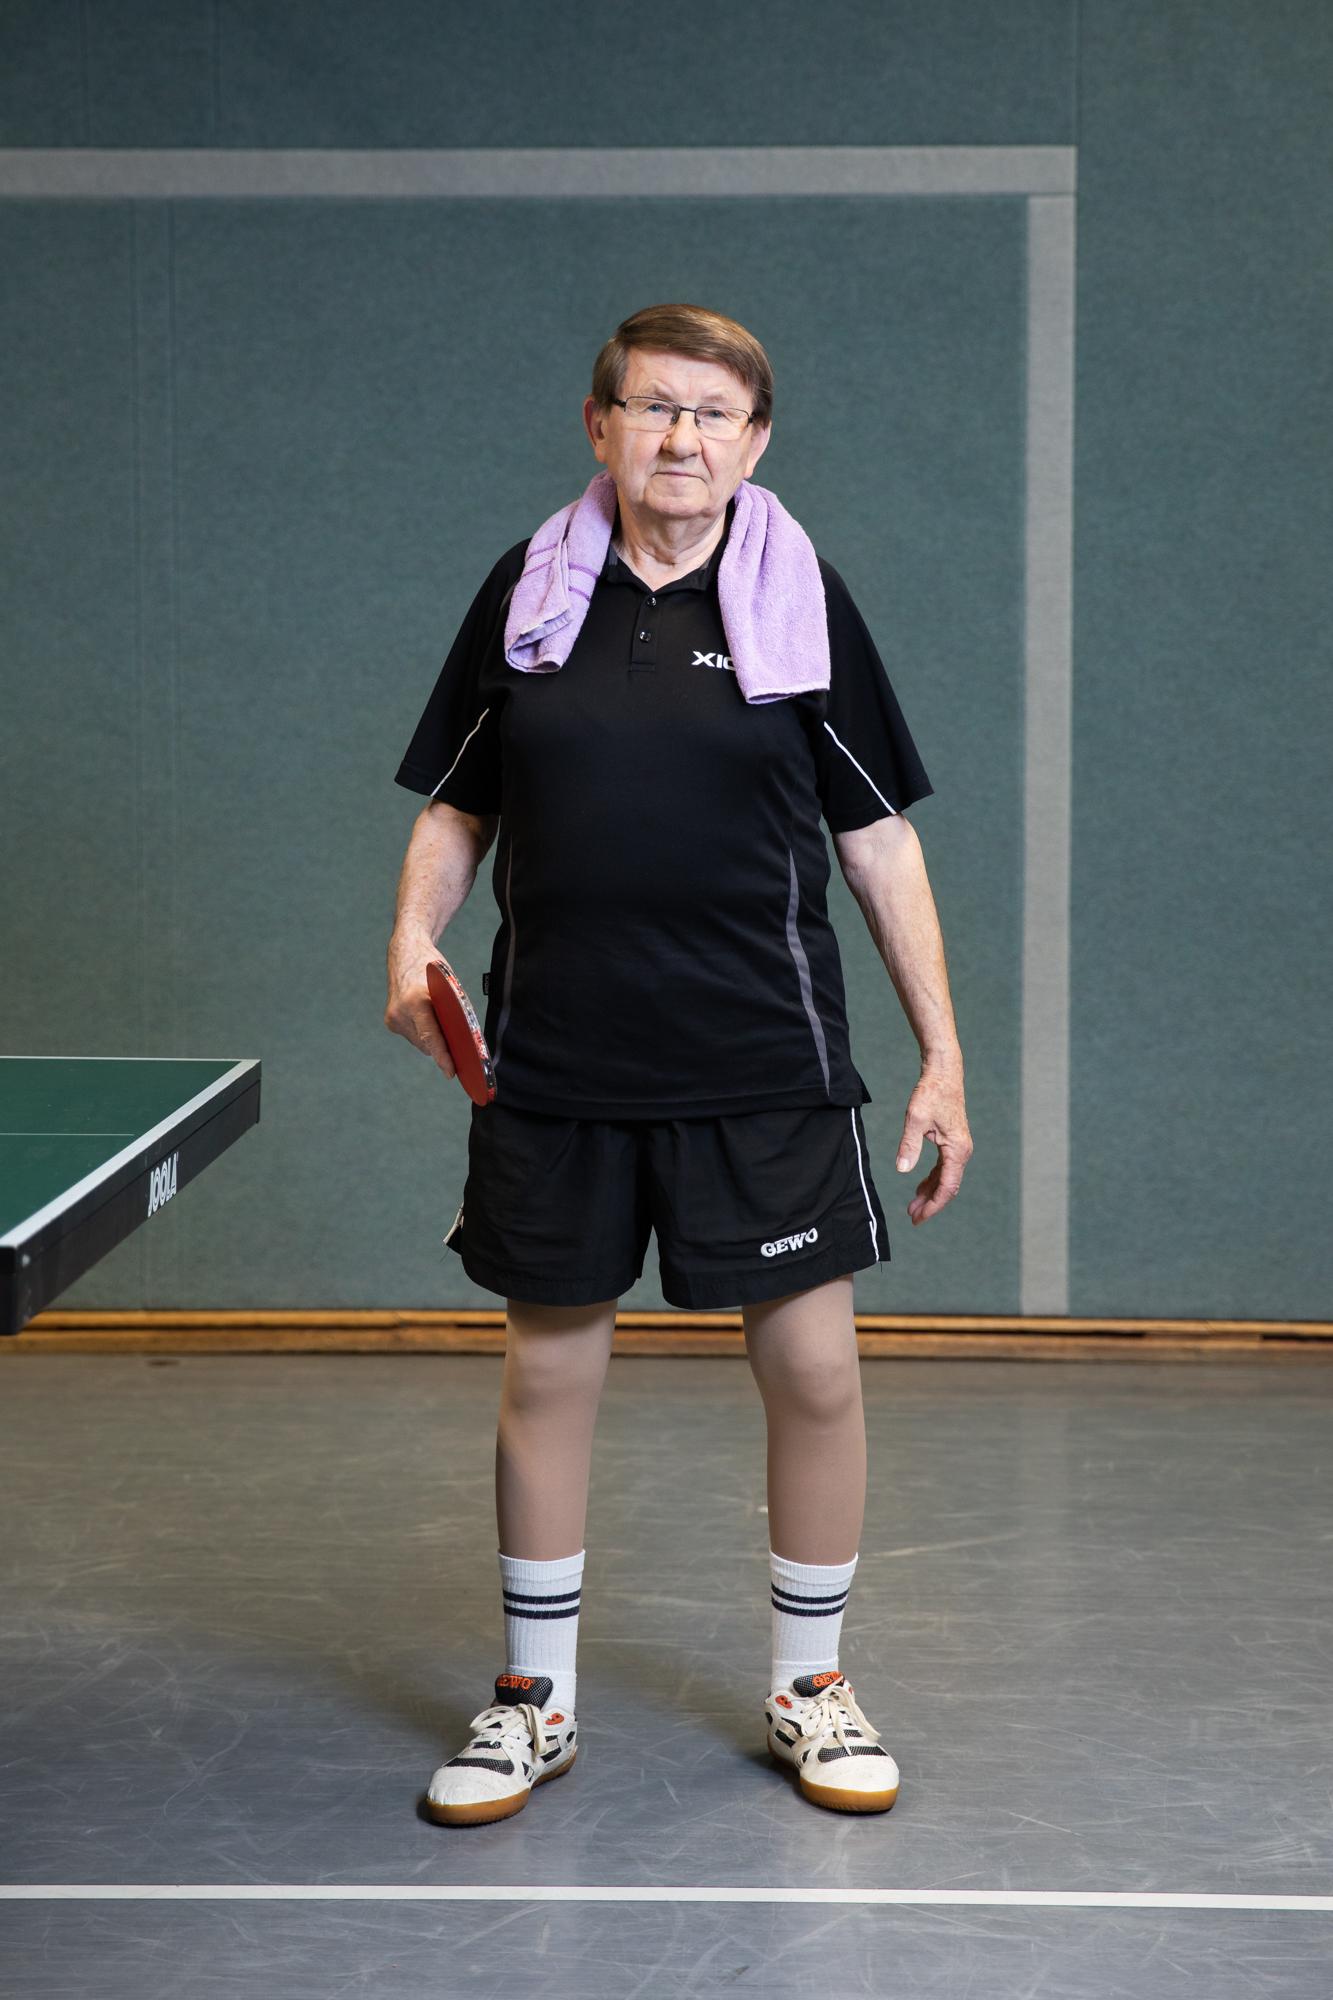 Georg, 80 years, Badenstedter SC